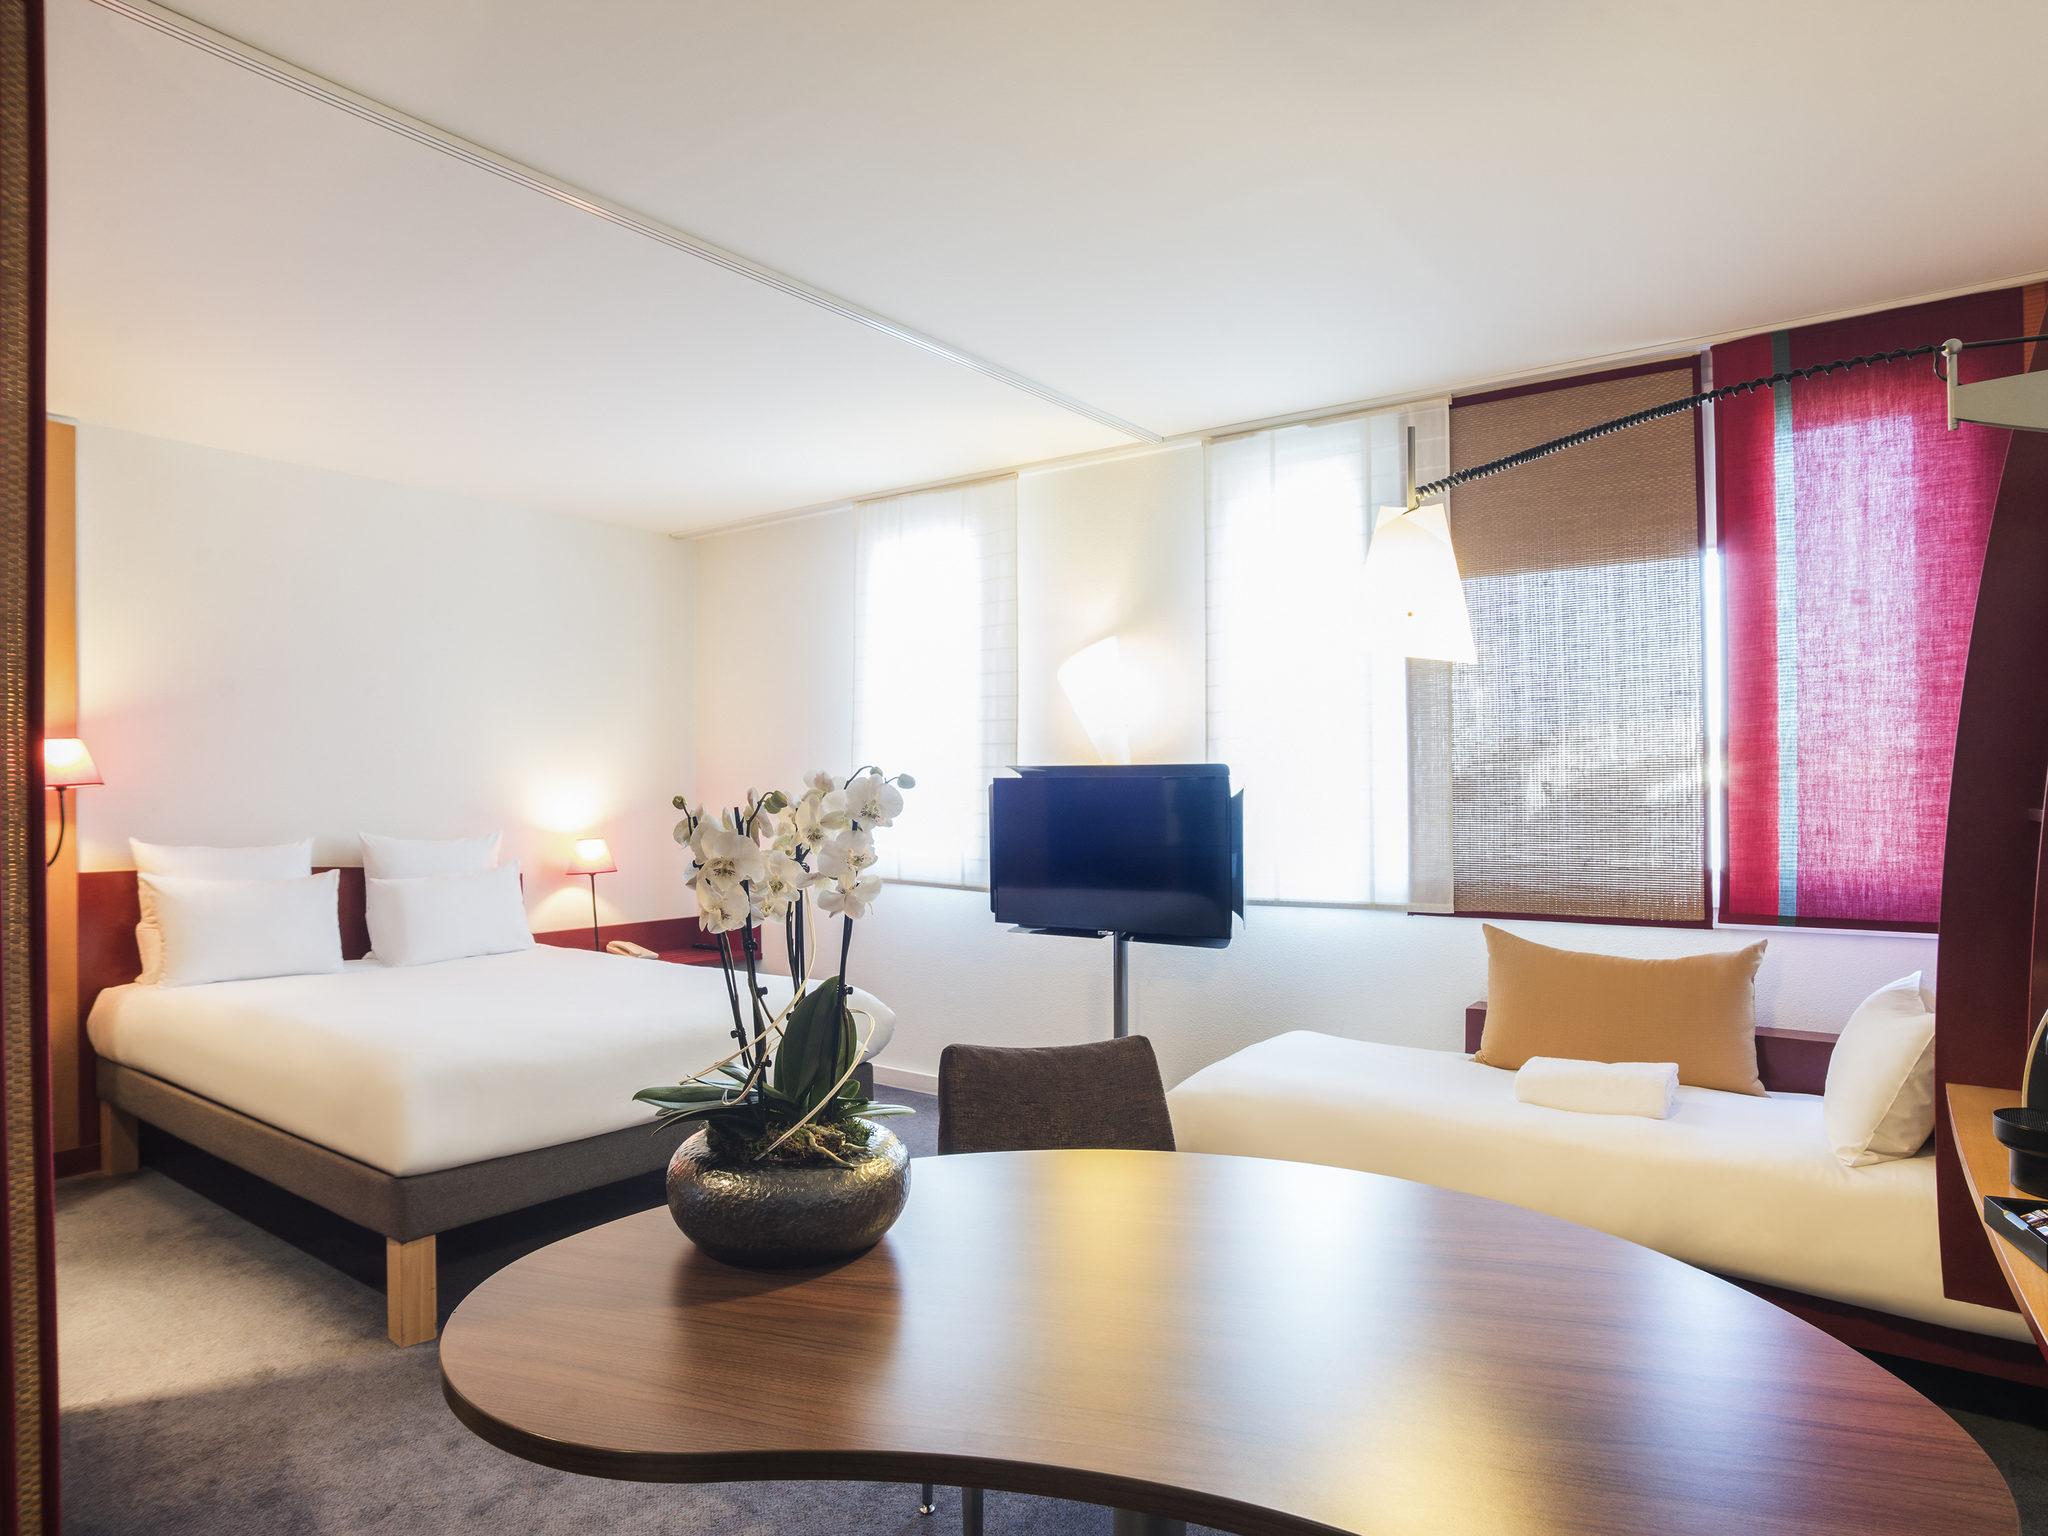 Hotel – Novotel Suites Reims Centre